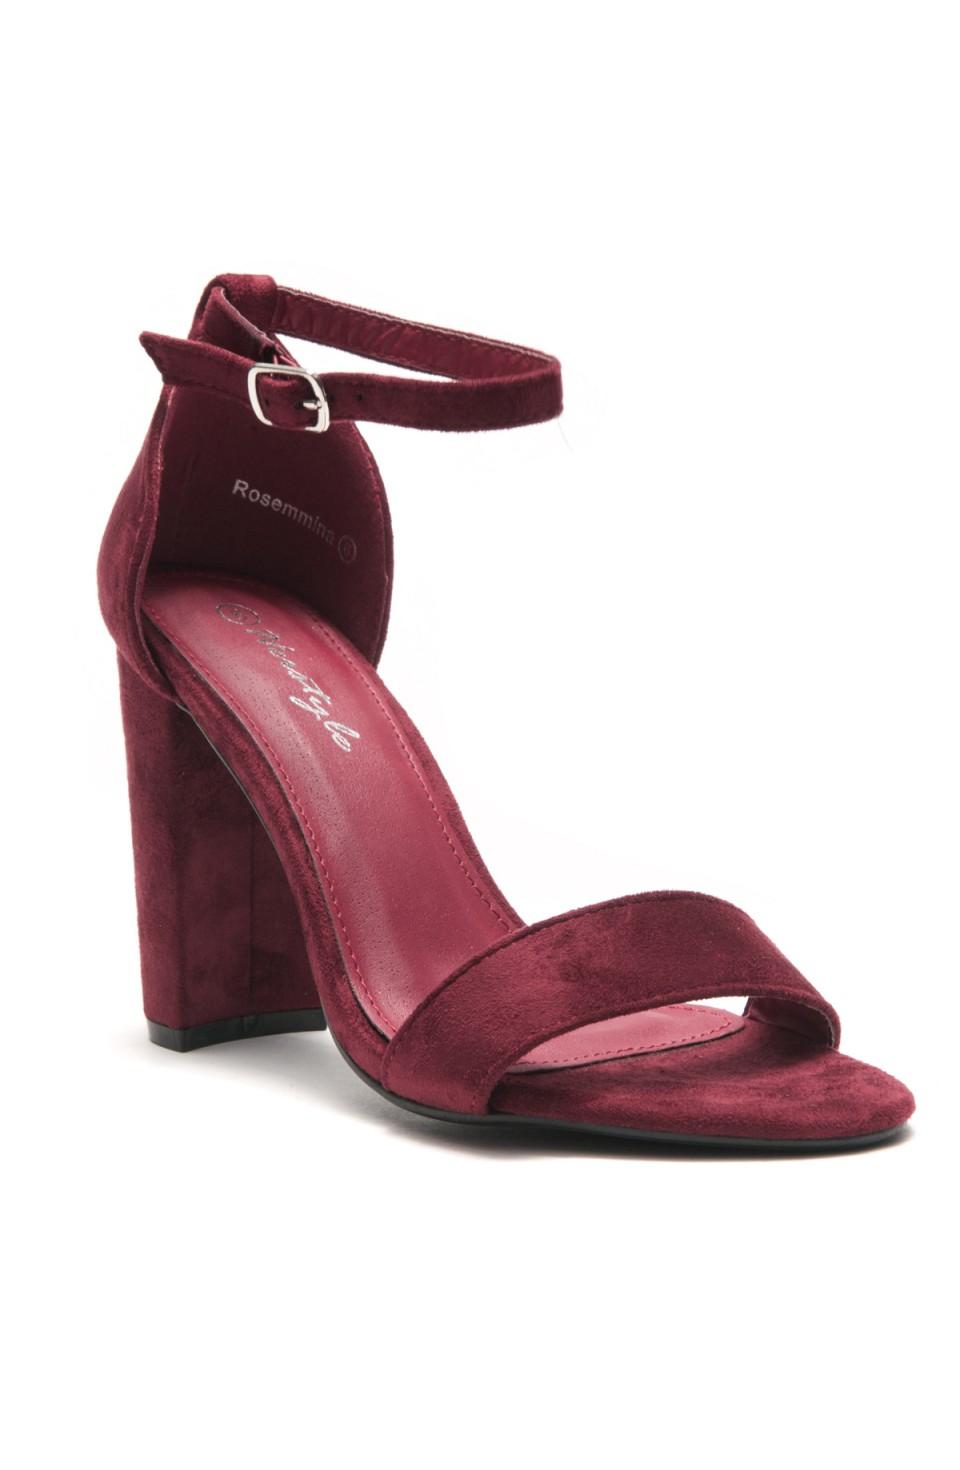 HerStyle Rosemmina Open Toe Ankle Strap Chunky Heel (Burgundy)